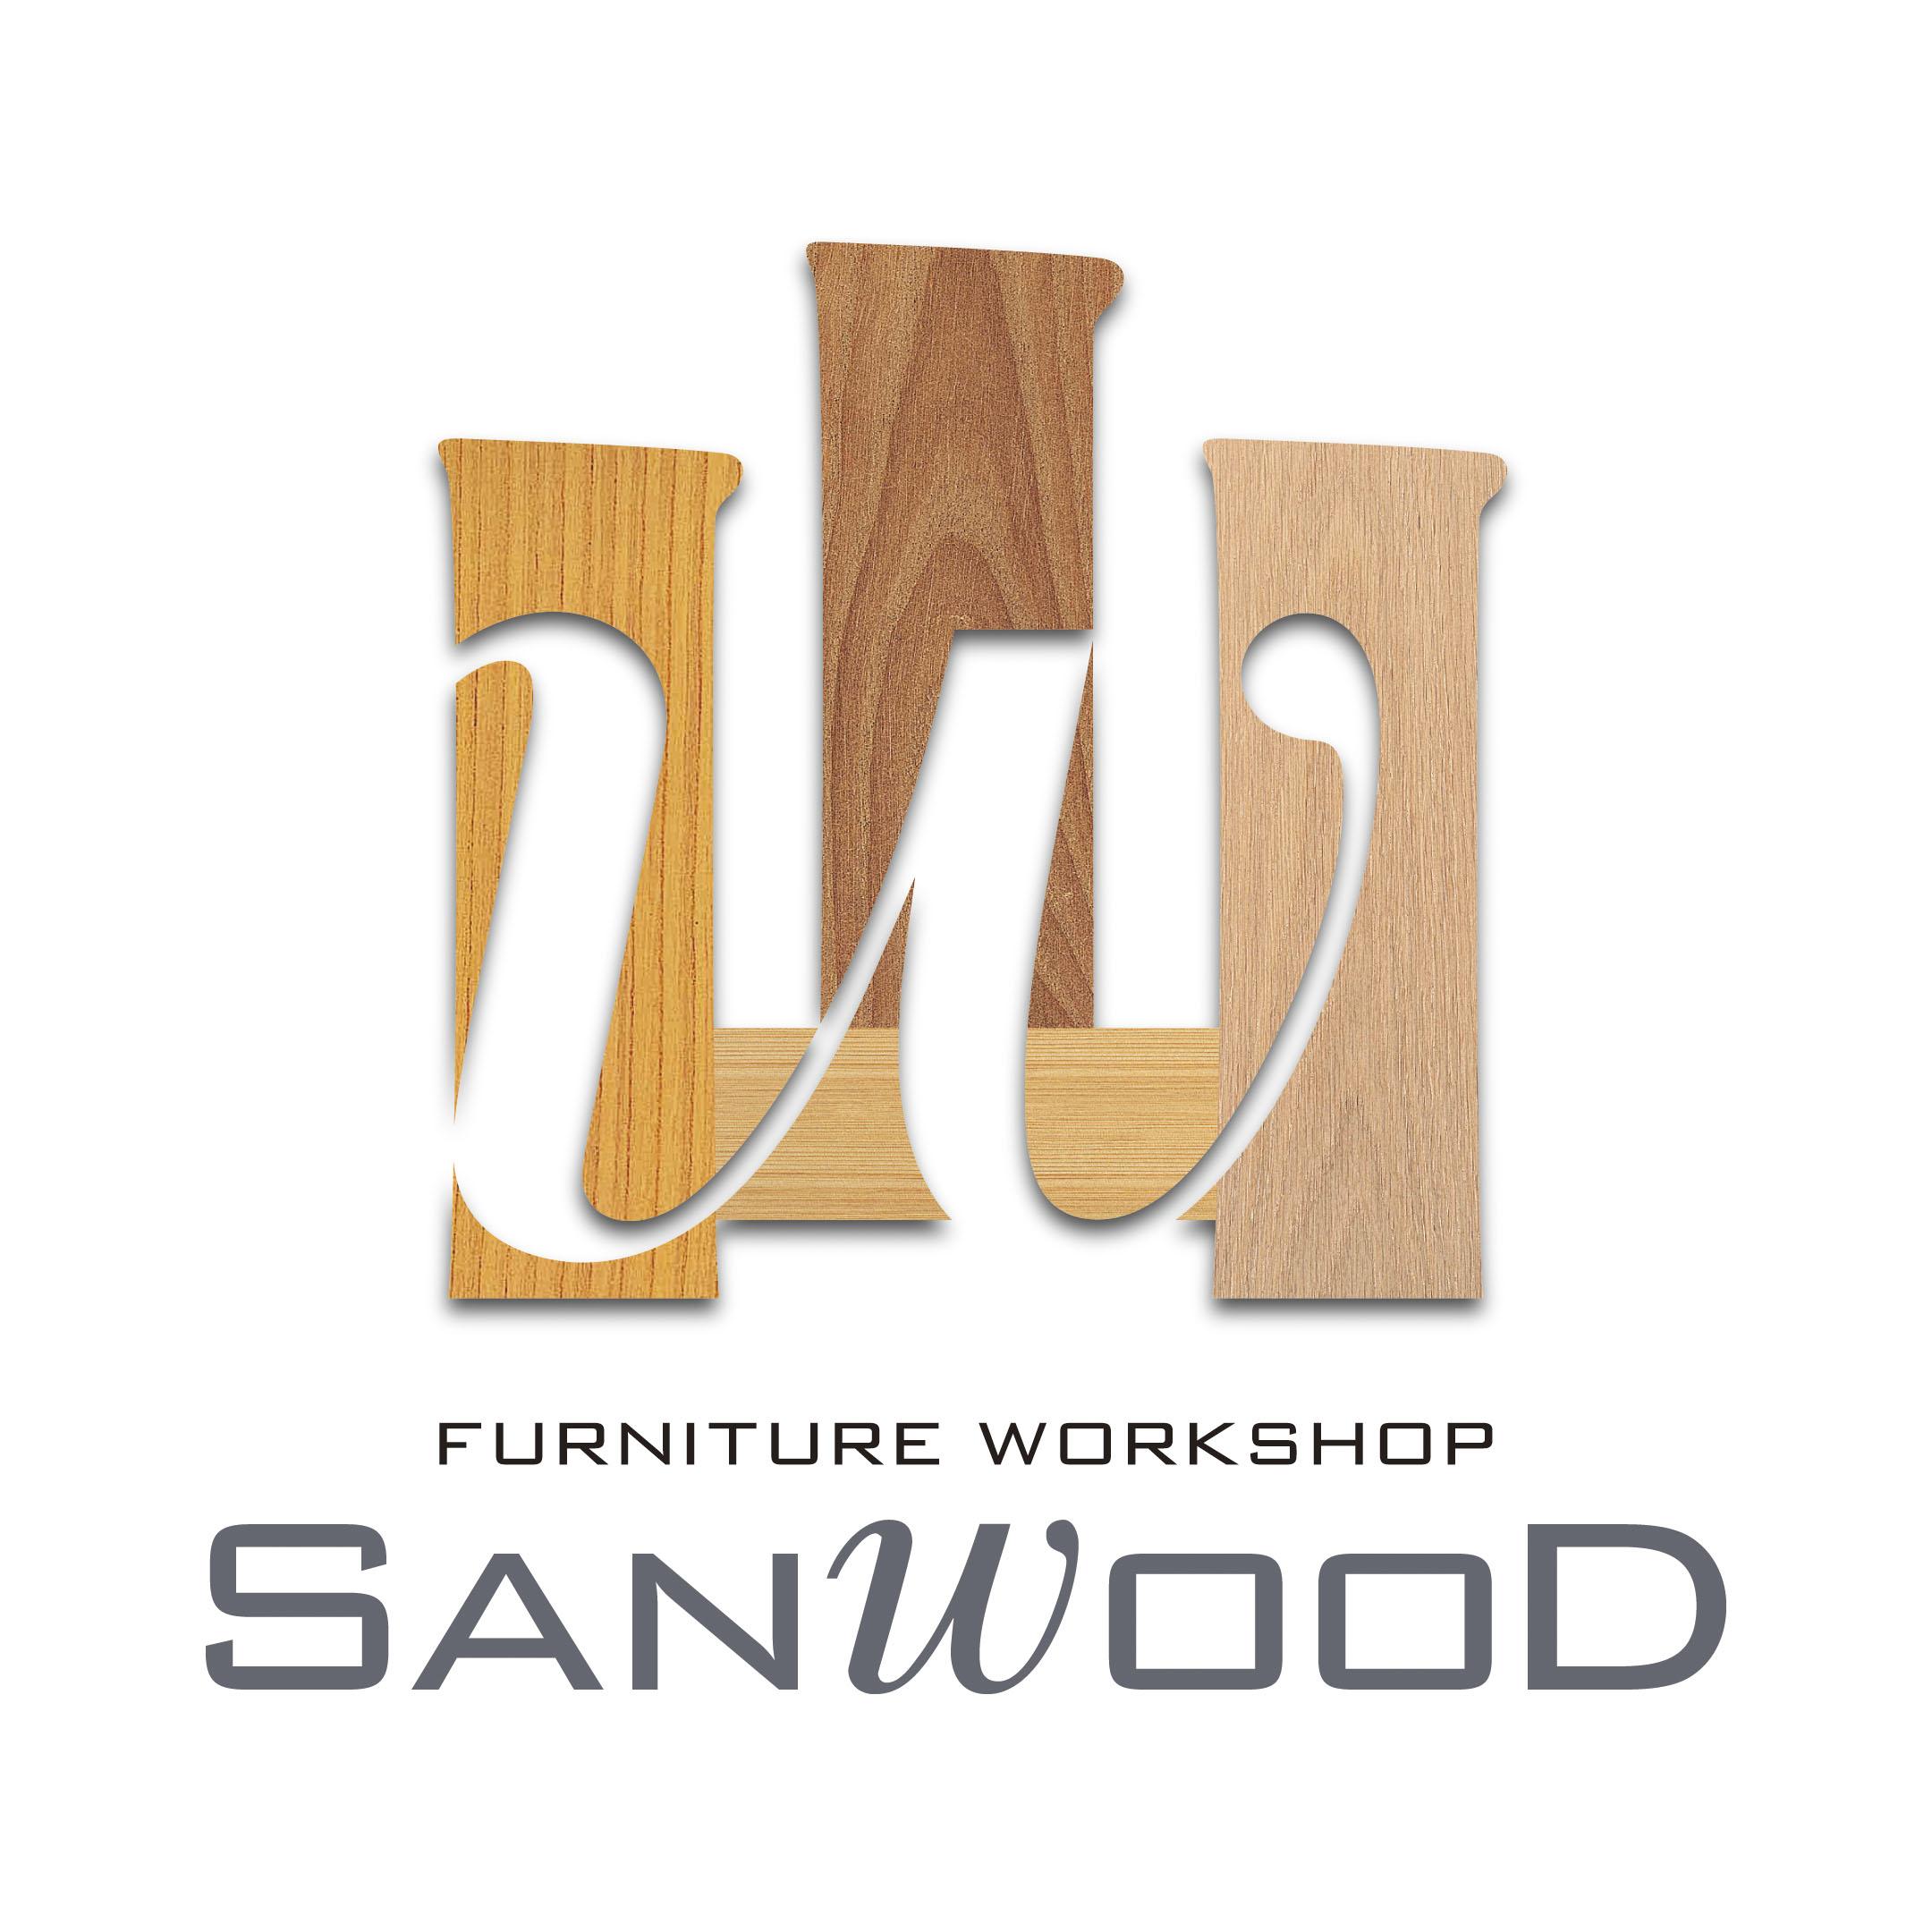 Furniture Workshop Sanwood